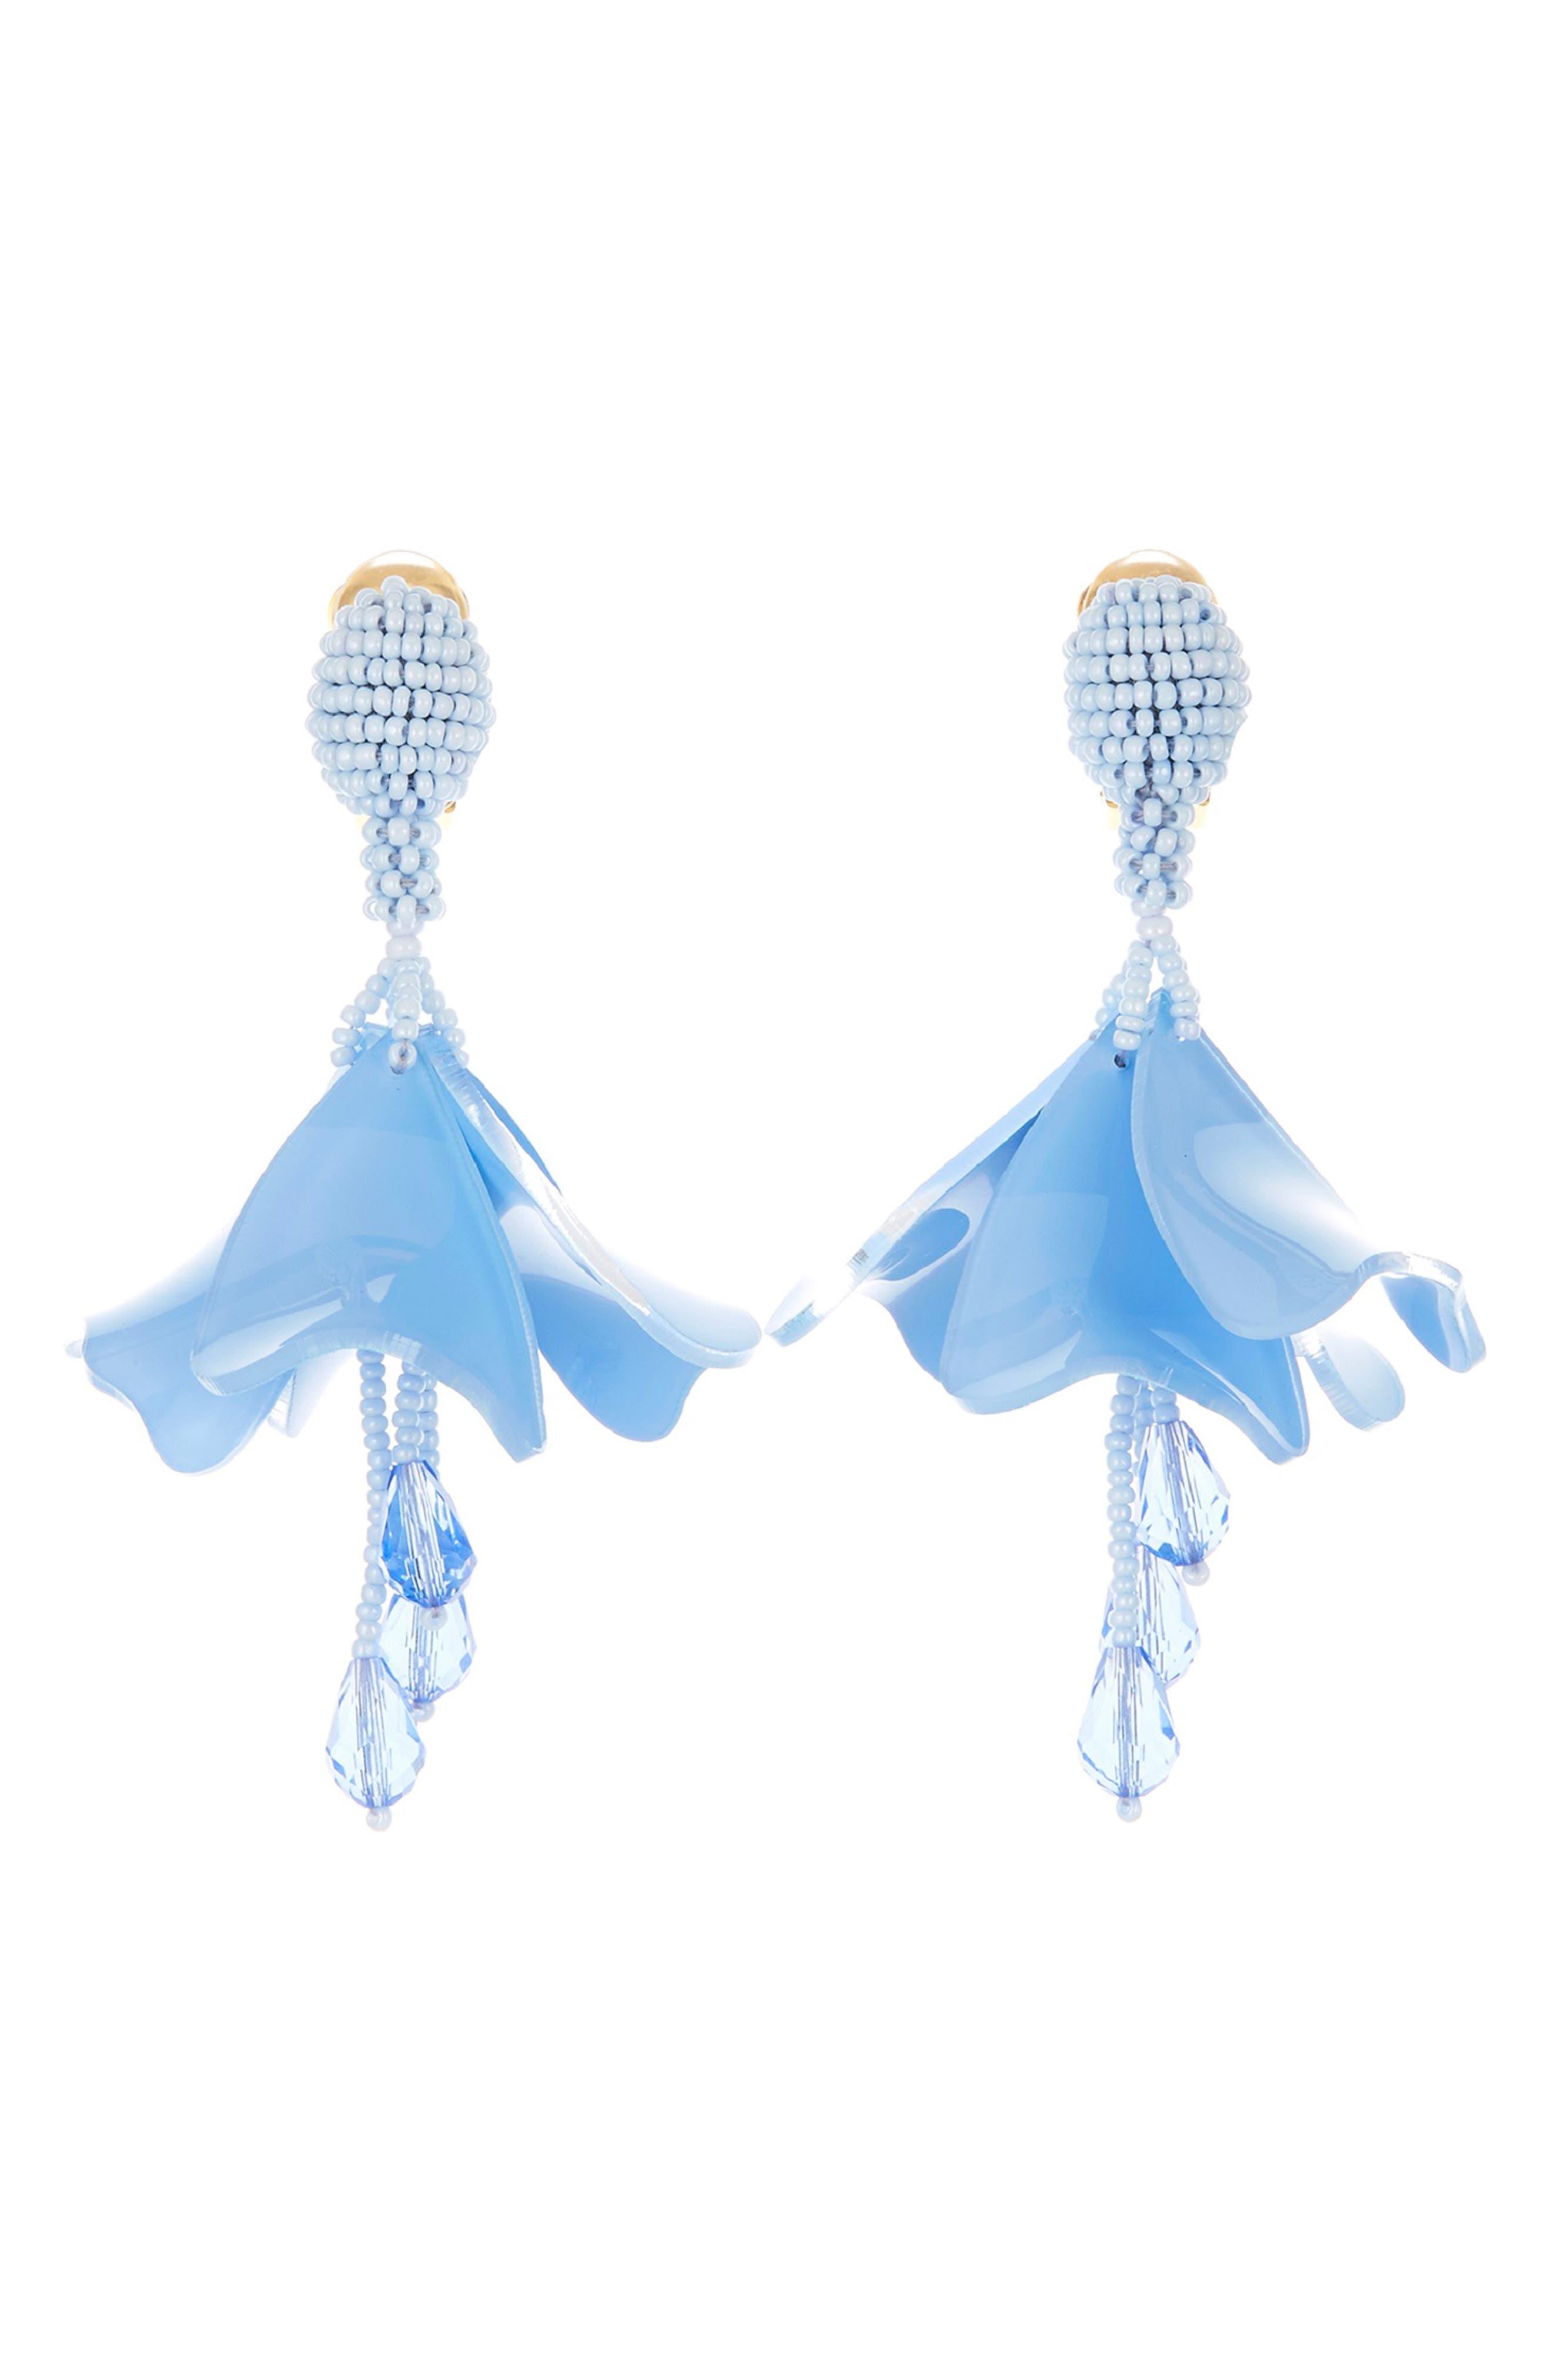 Resort 19 Small Impatiens Clip Earrings,                             Main thumbnail 1, color,                             WEDGEWOOD